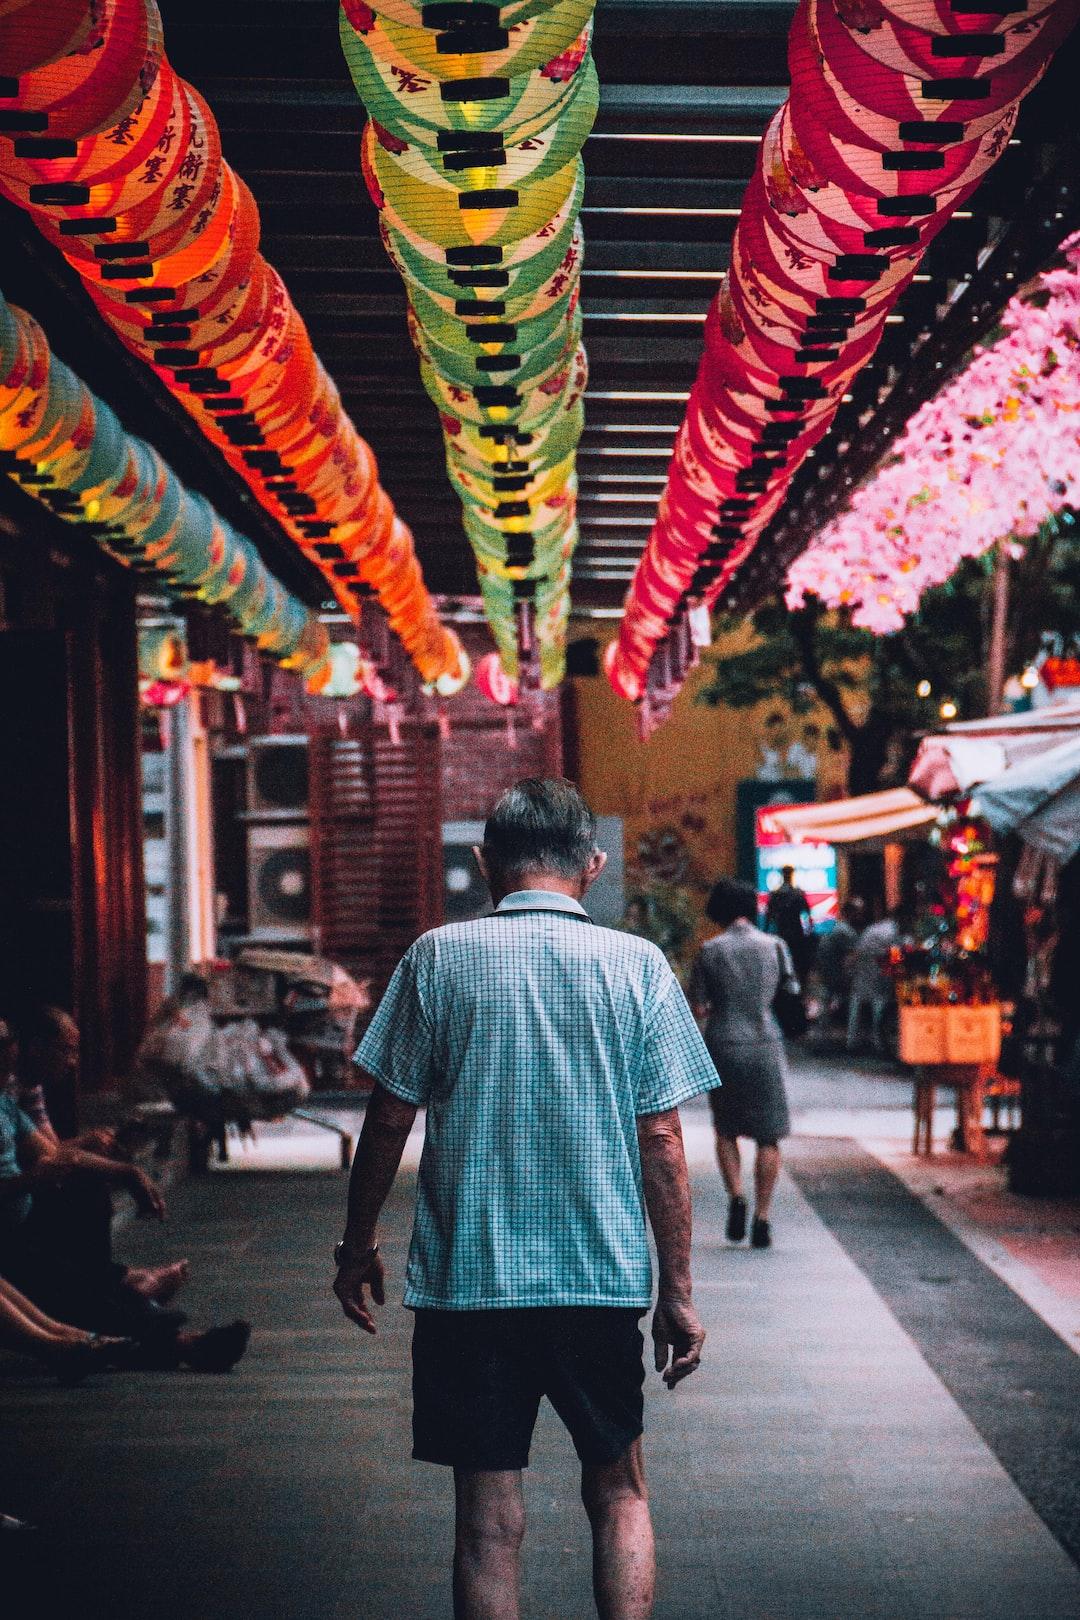 Elderly man in the marketplace